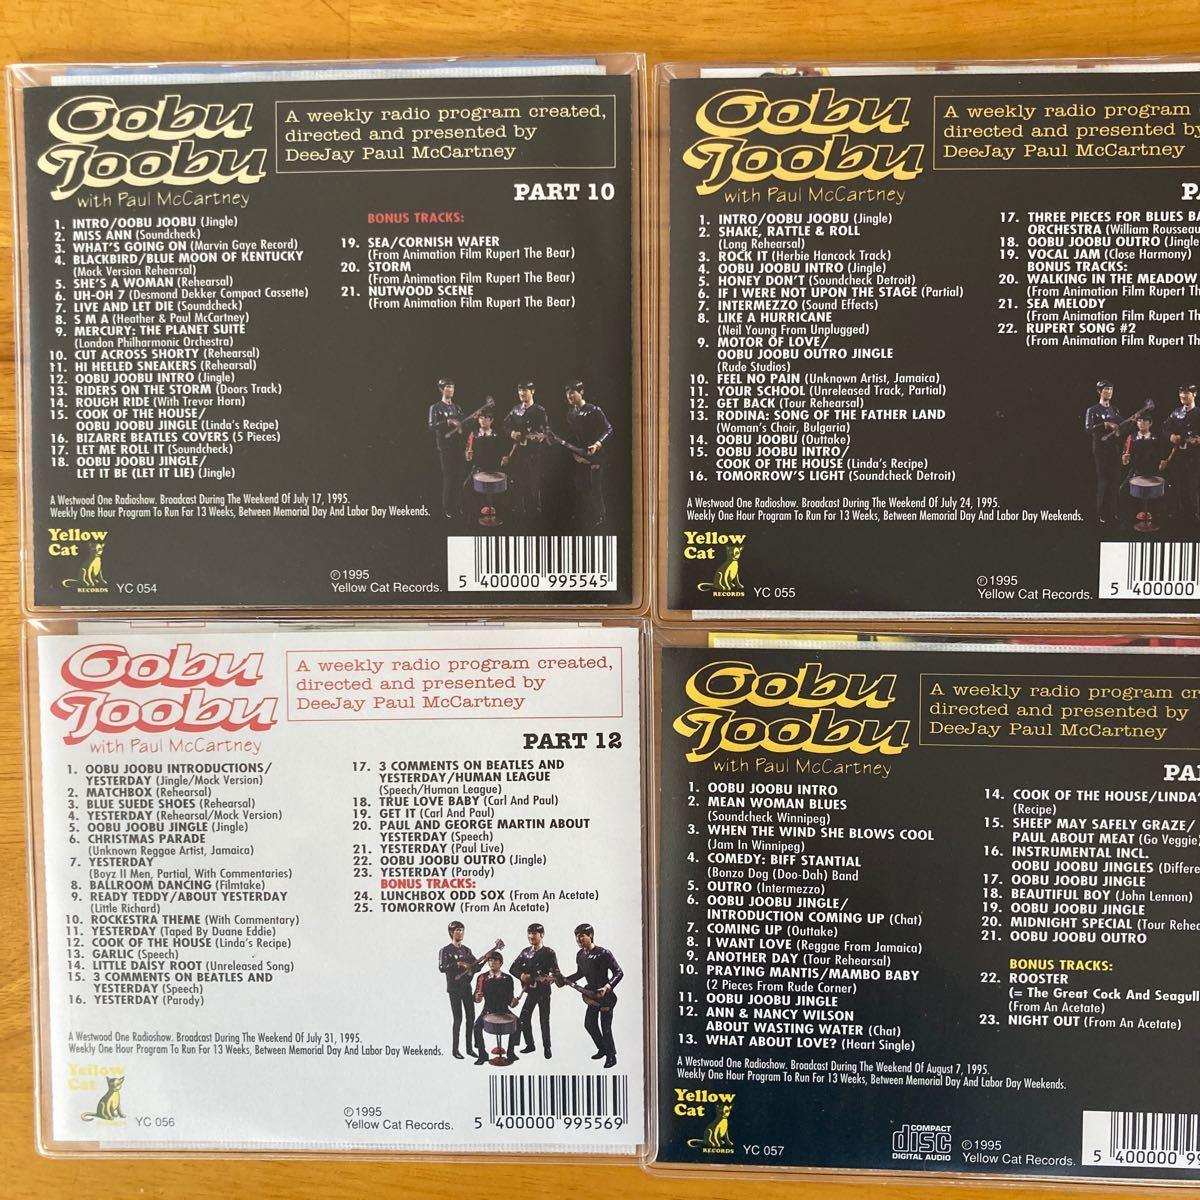 Paul McCartney CD Oobu  Joobu 15組 17枚 ビートルズ Beatles コレクターズCD